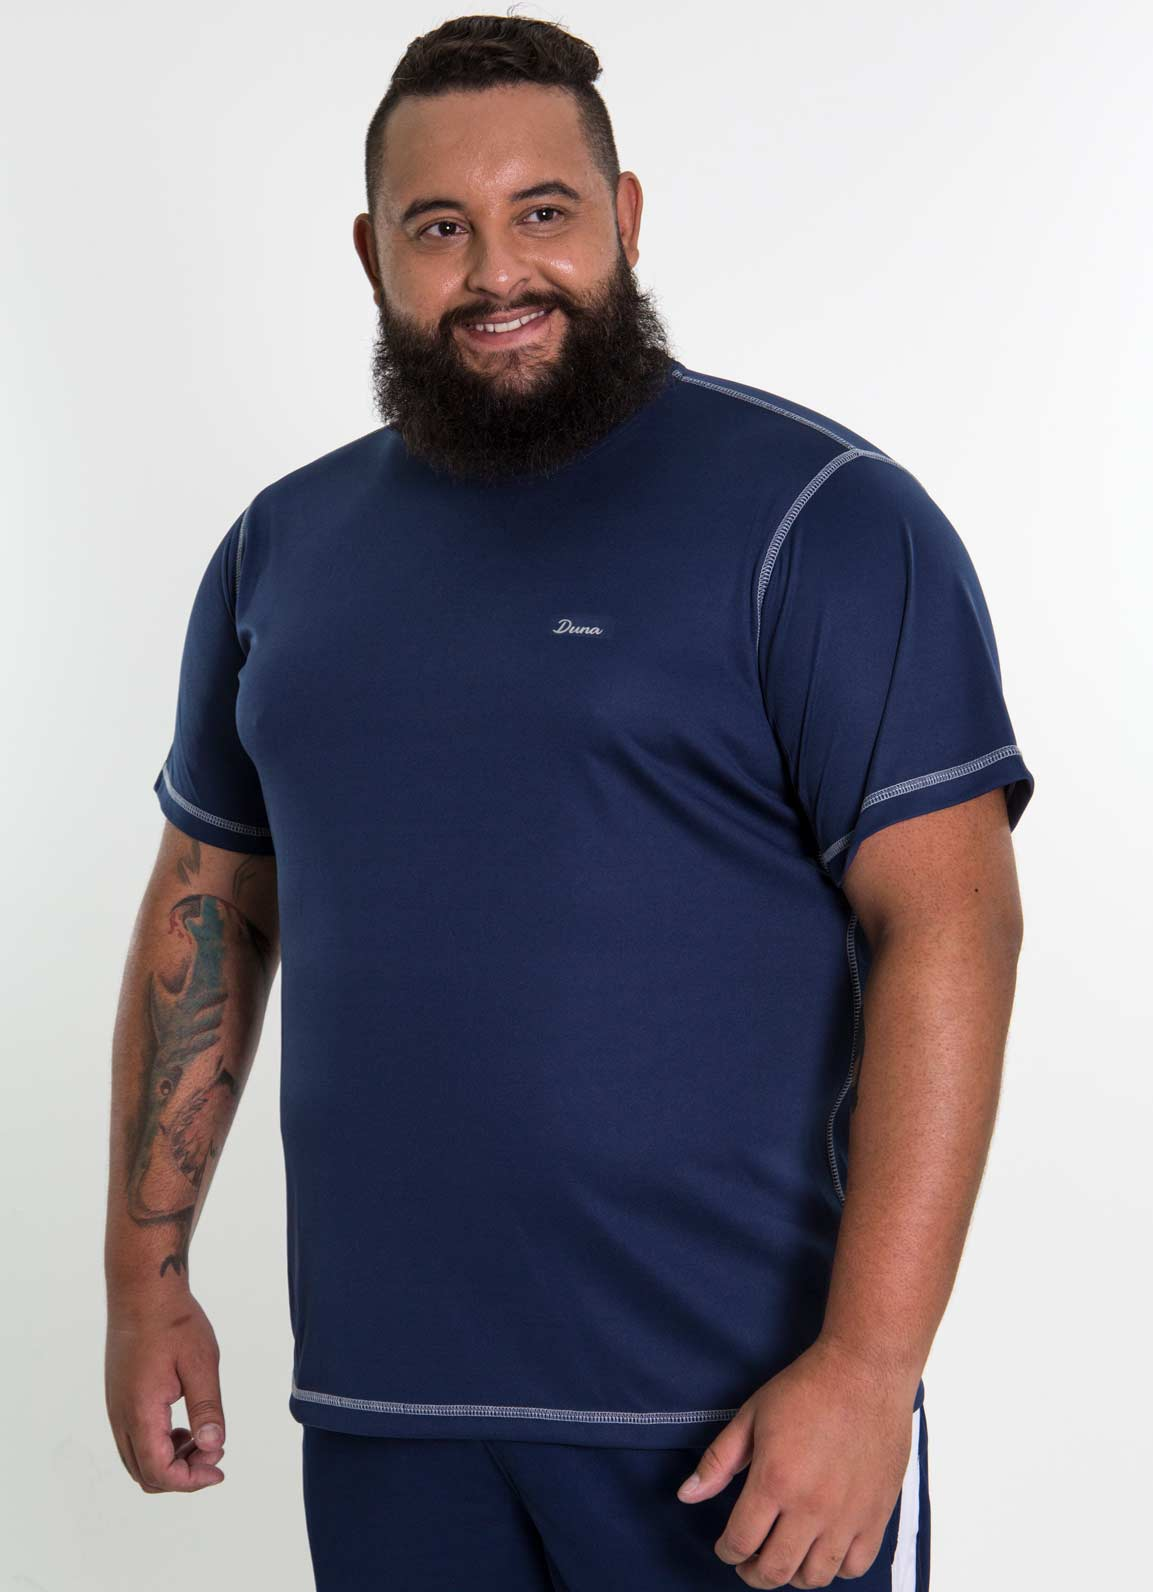 Camiseta Básica Plus Size Masculina - DRY FIT